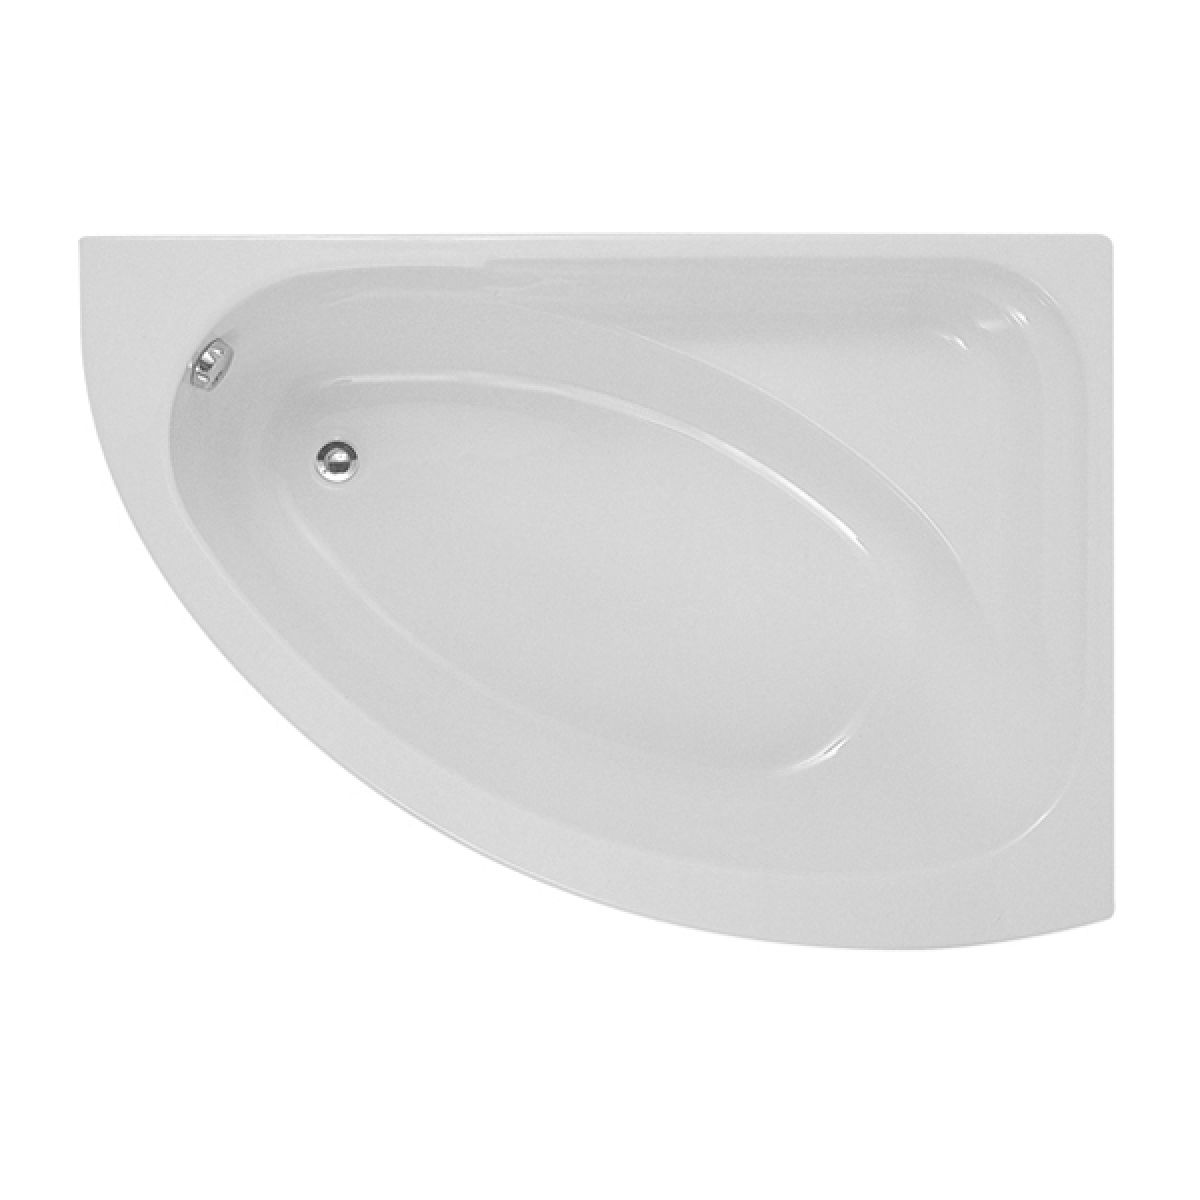 Moods Orlando Luxury Right Handed Corner Bath 1495 x 1010mm